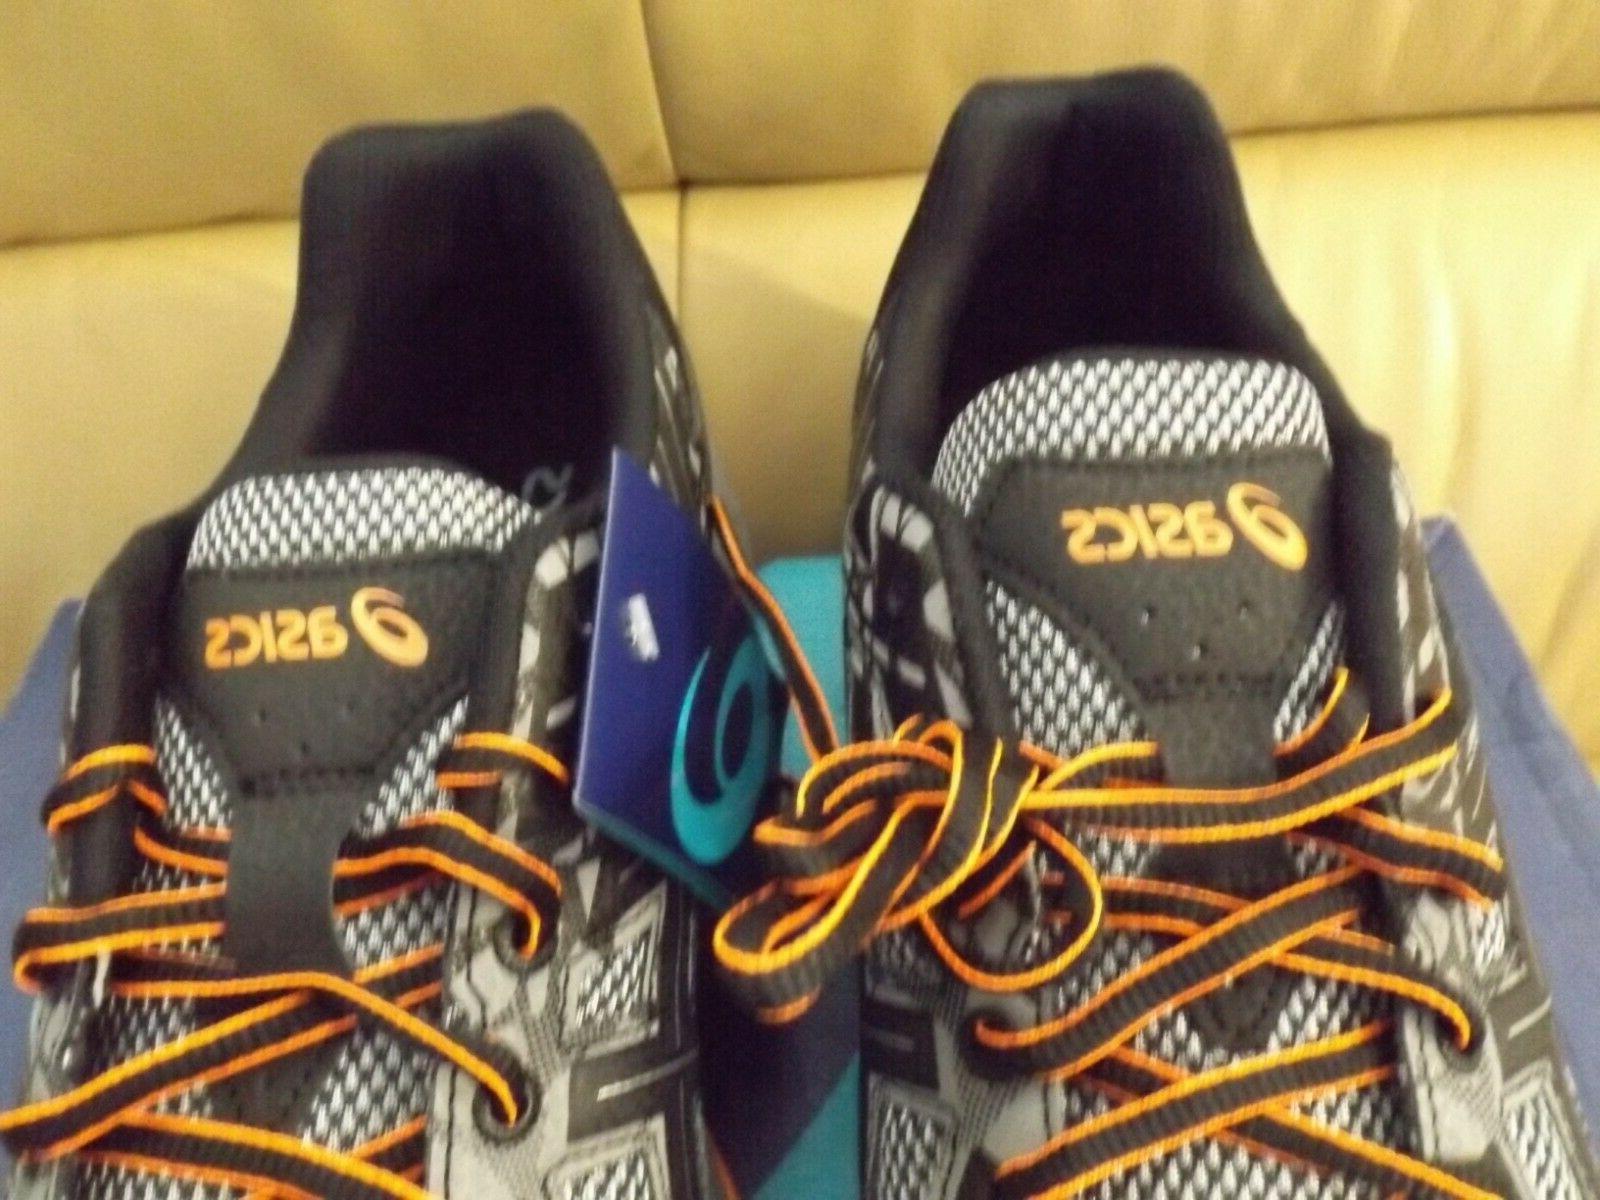 ASICS GEL-Venture Size 14 Shoes T6G1Q-9616 NEW